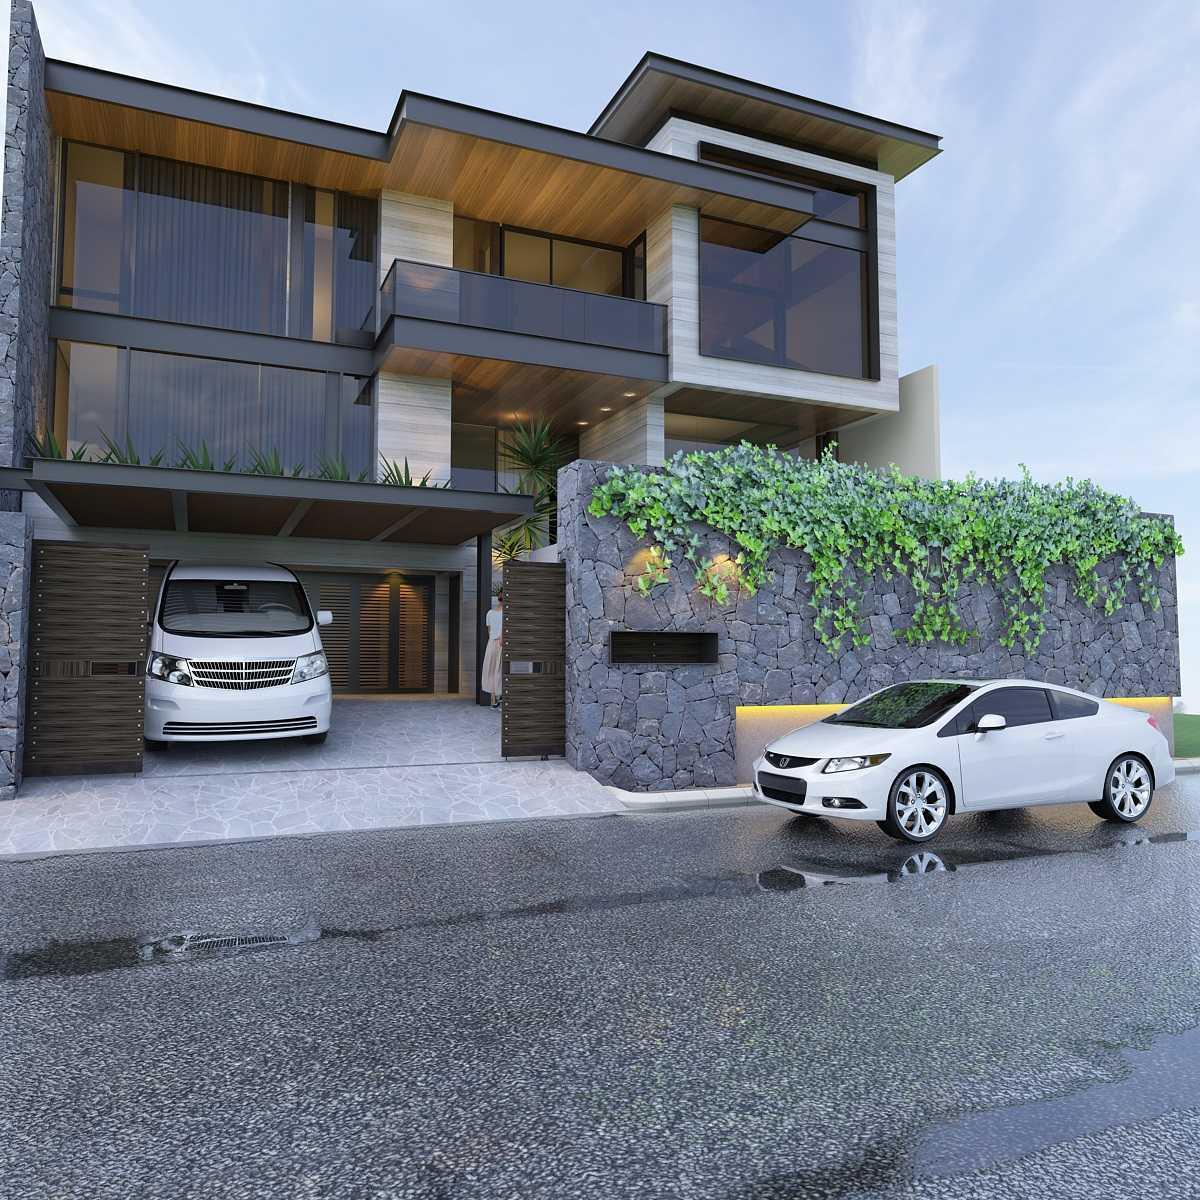 Pt. Indodesign Kreasi Mandiri Pantai Indah Kapuk House Jakarta, Indonesia Jakarta, Indonesia Facade-Option-2  8629